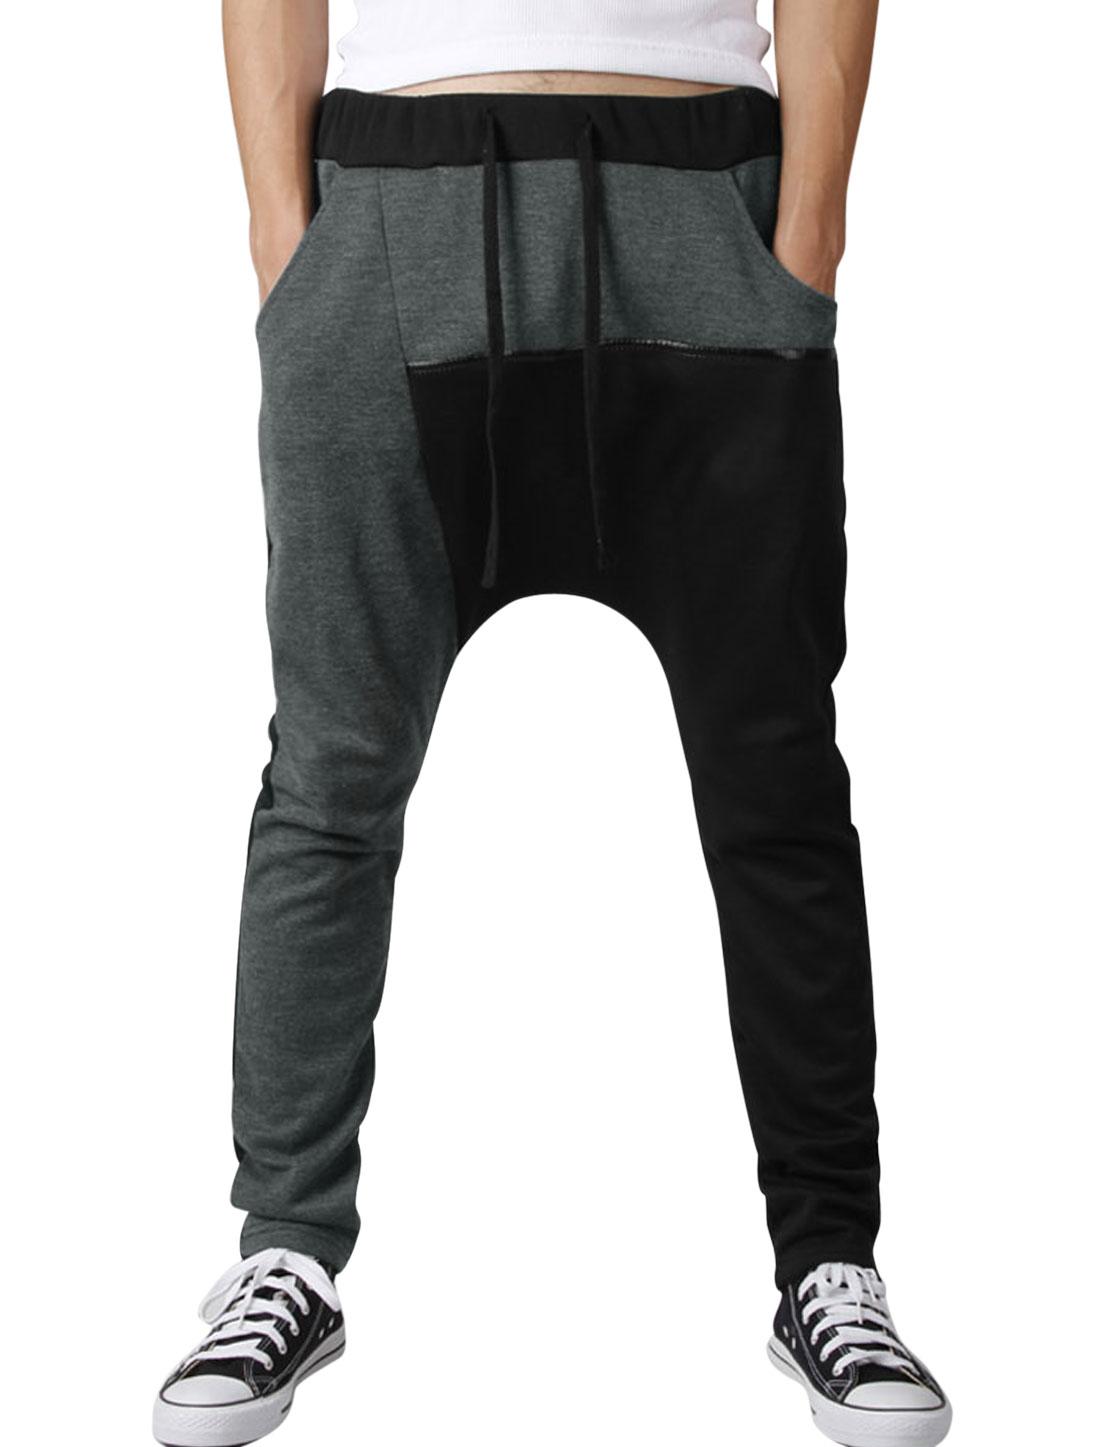 Men Contrast Color Splicing Patch Pockets Back Casual Harem Pants Black Dark Gray W30